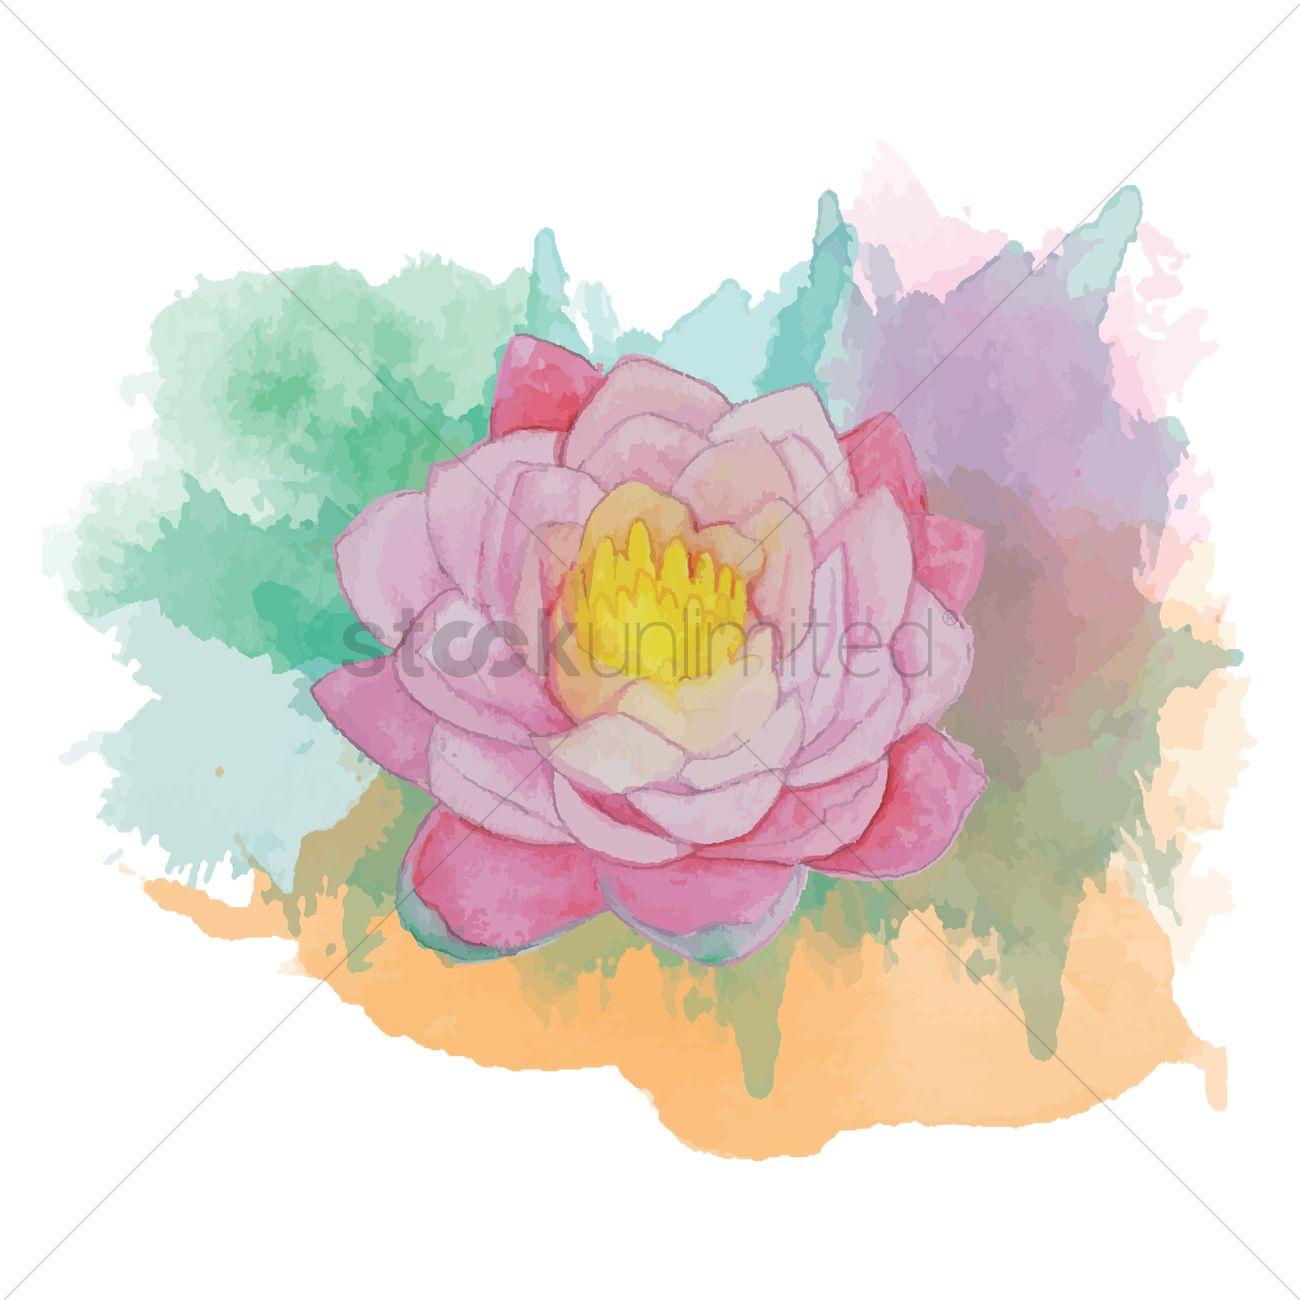 Lotus Flower Vector Image 1869388 Stockunlimited